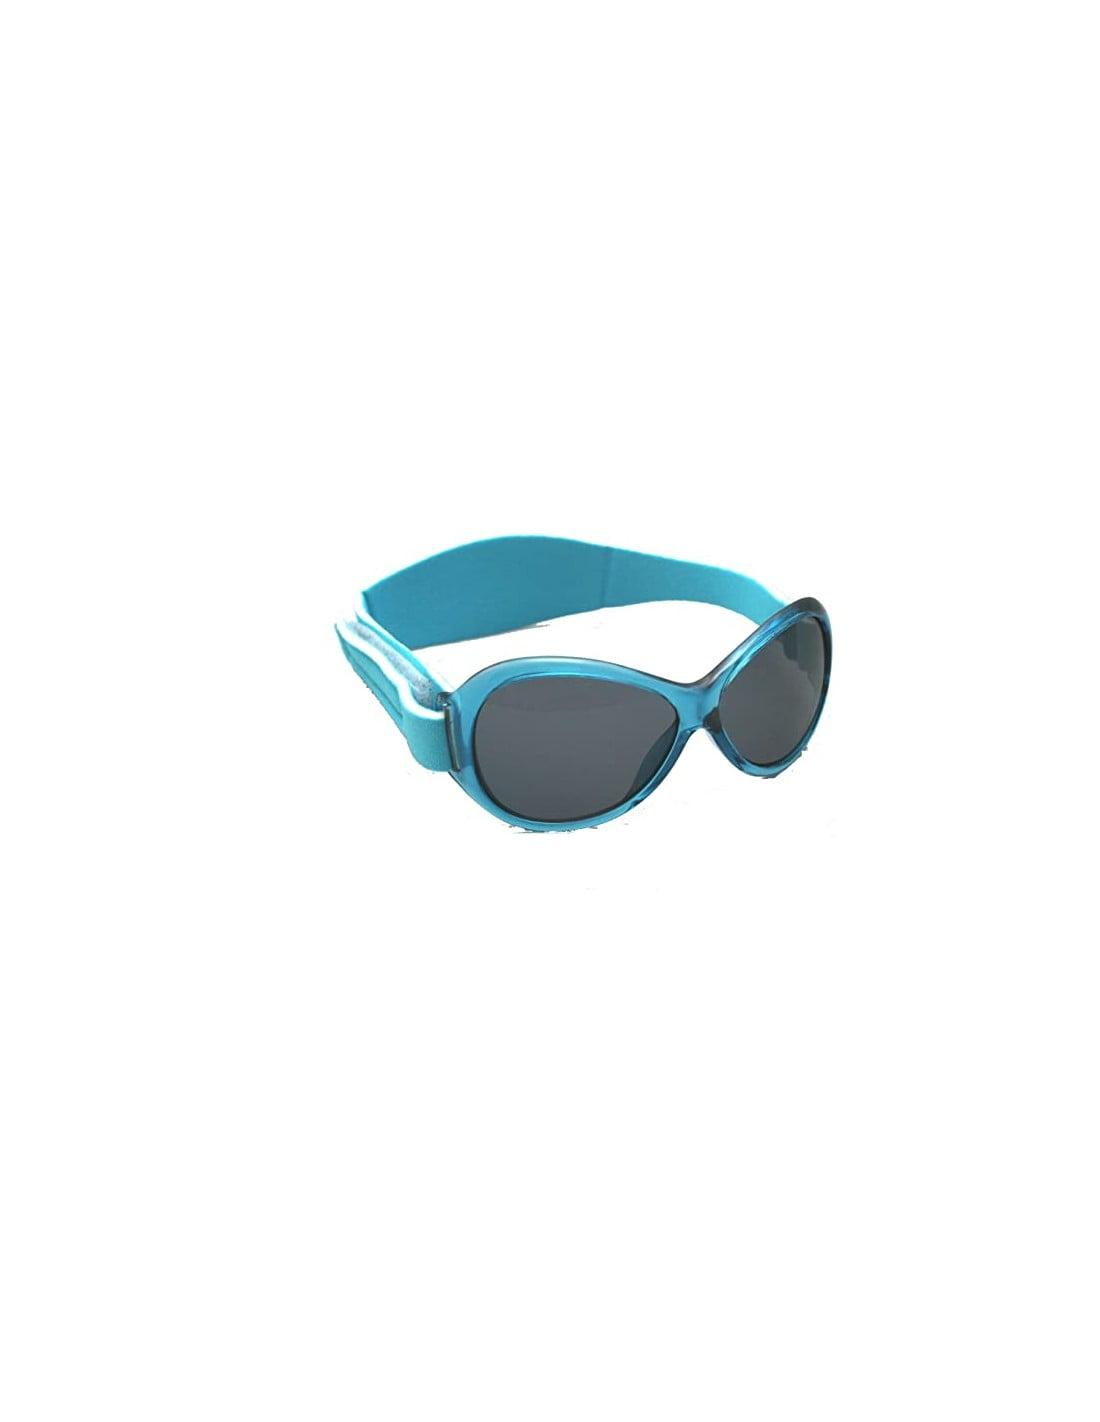 Ochelari de soare Bebe 0-2 ani Retro Oval Aqua Banz